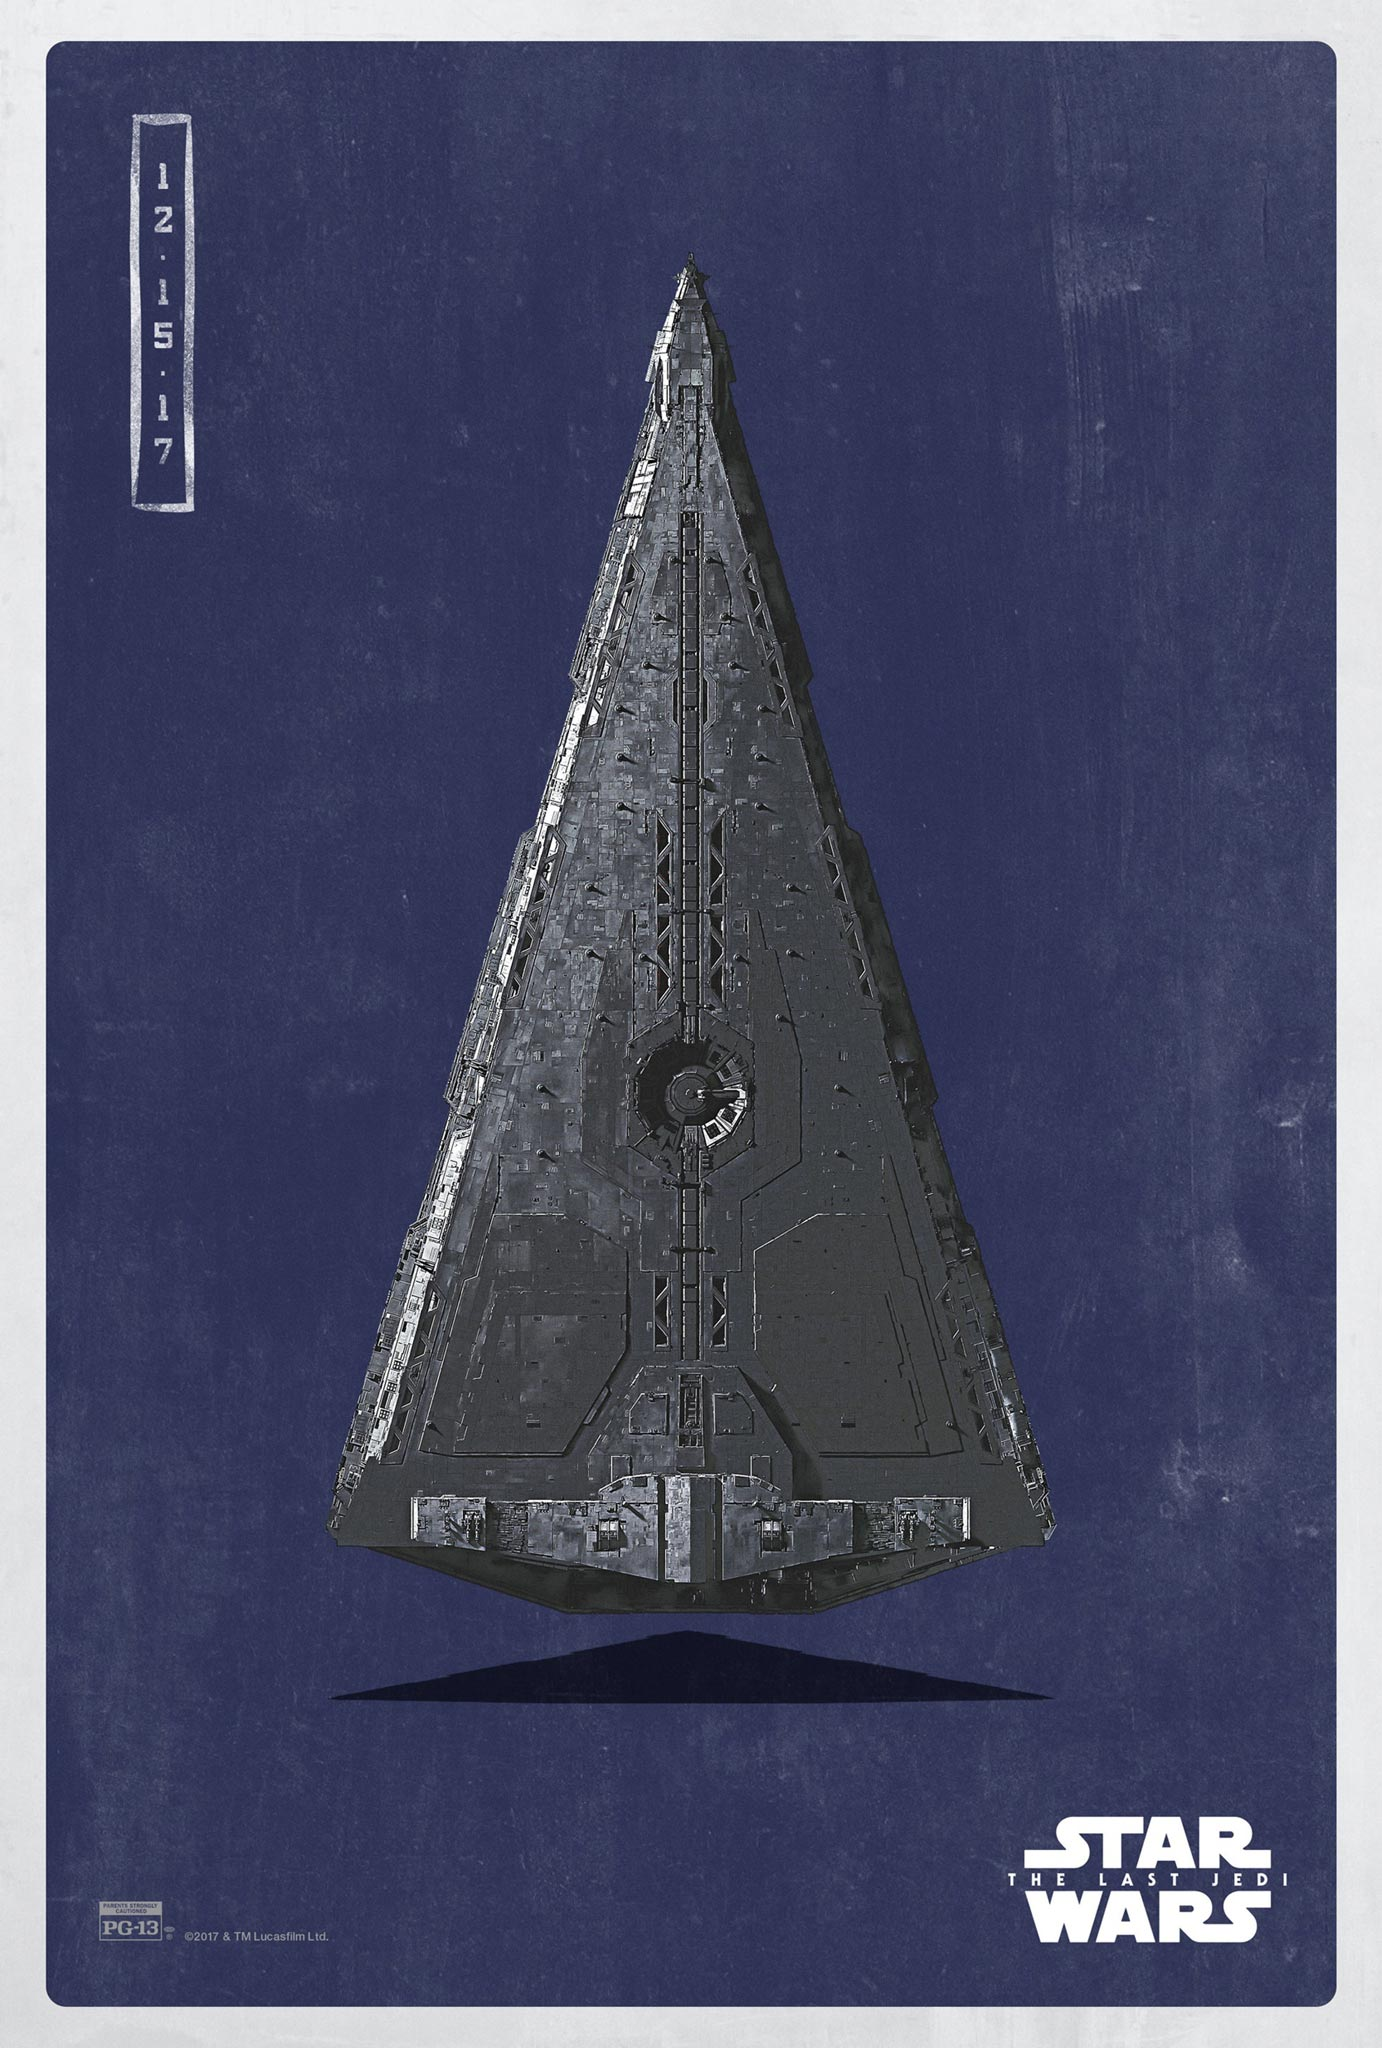 Star Wars: Episode VIII - The Last Jedi Poster #12